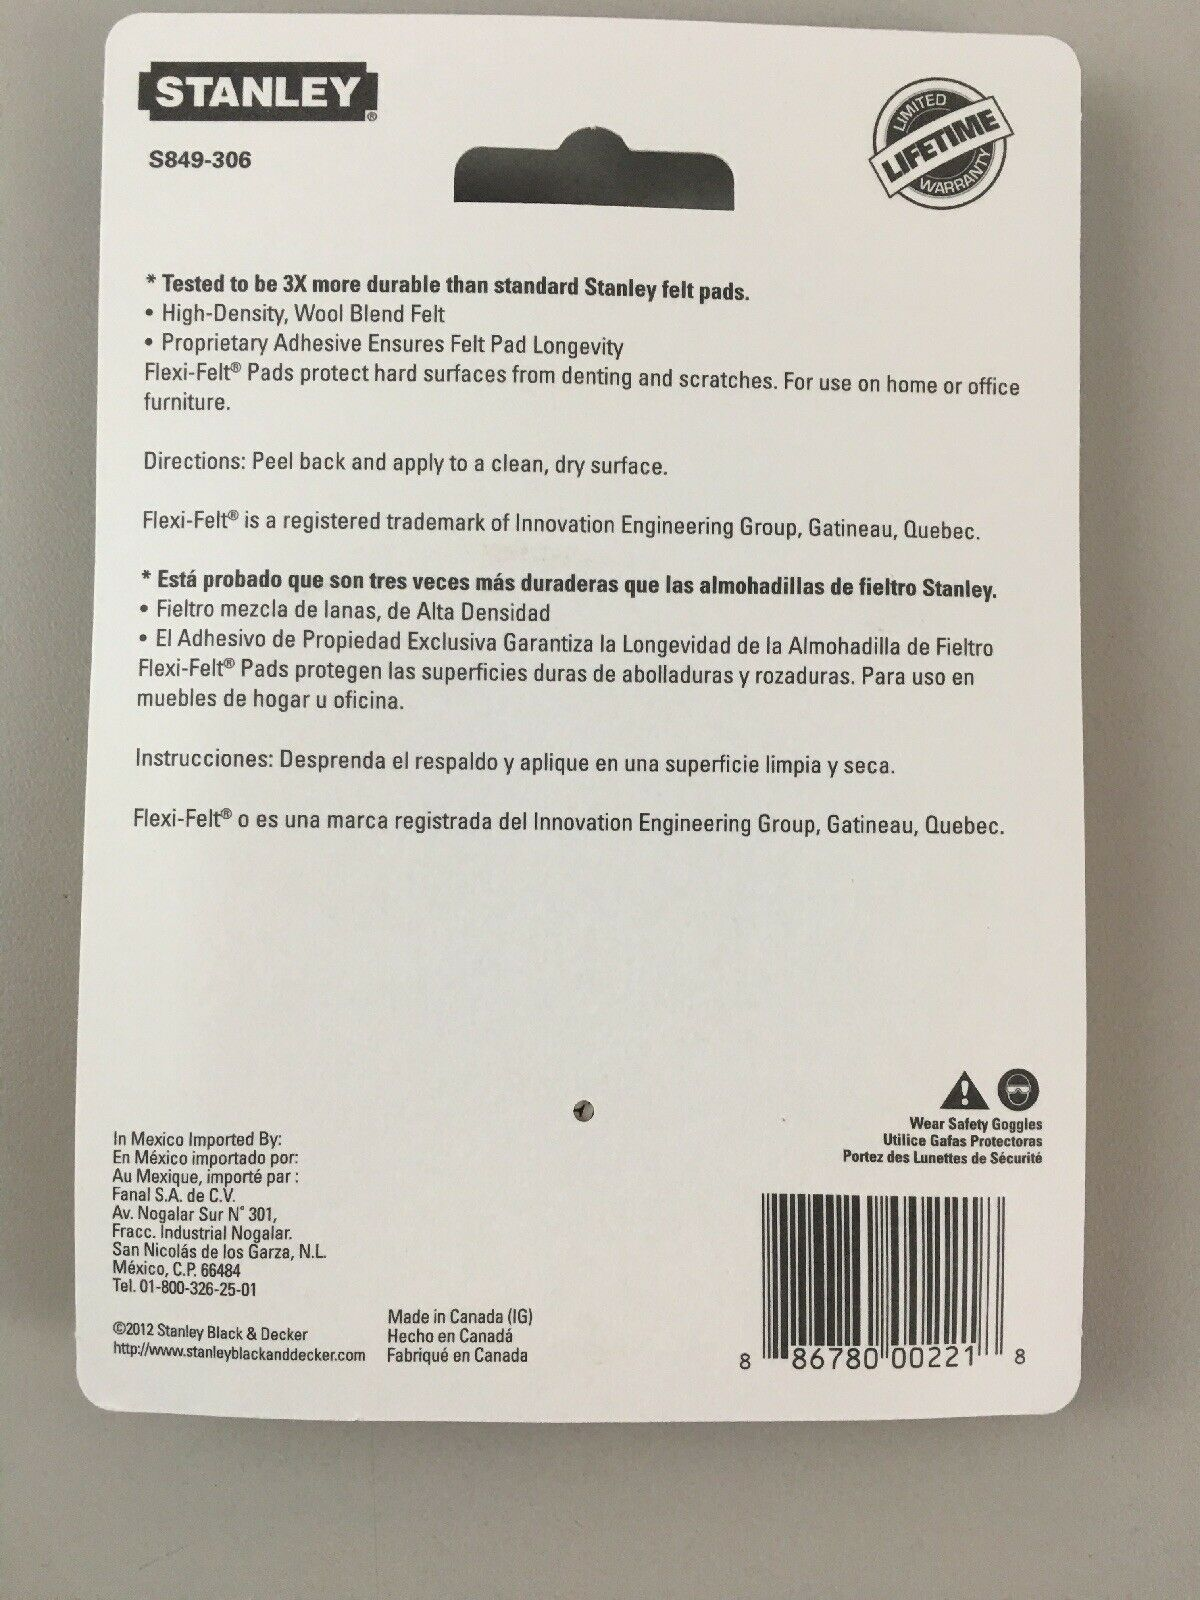 Stanley Hardware S849-306 V1732 Flexi-Felt Self-Adhesive Pads 3 2 piece